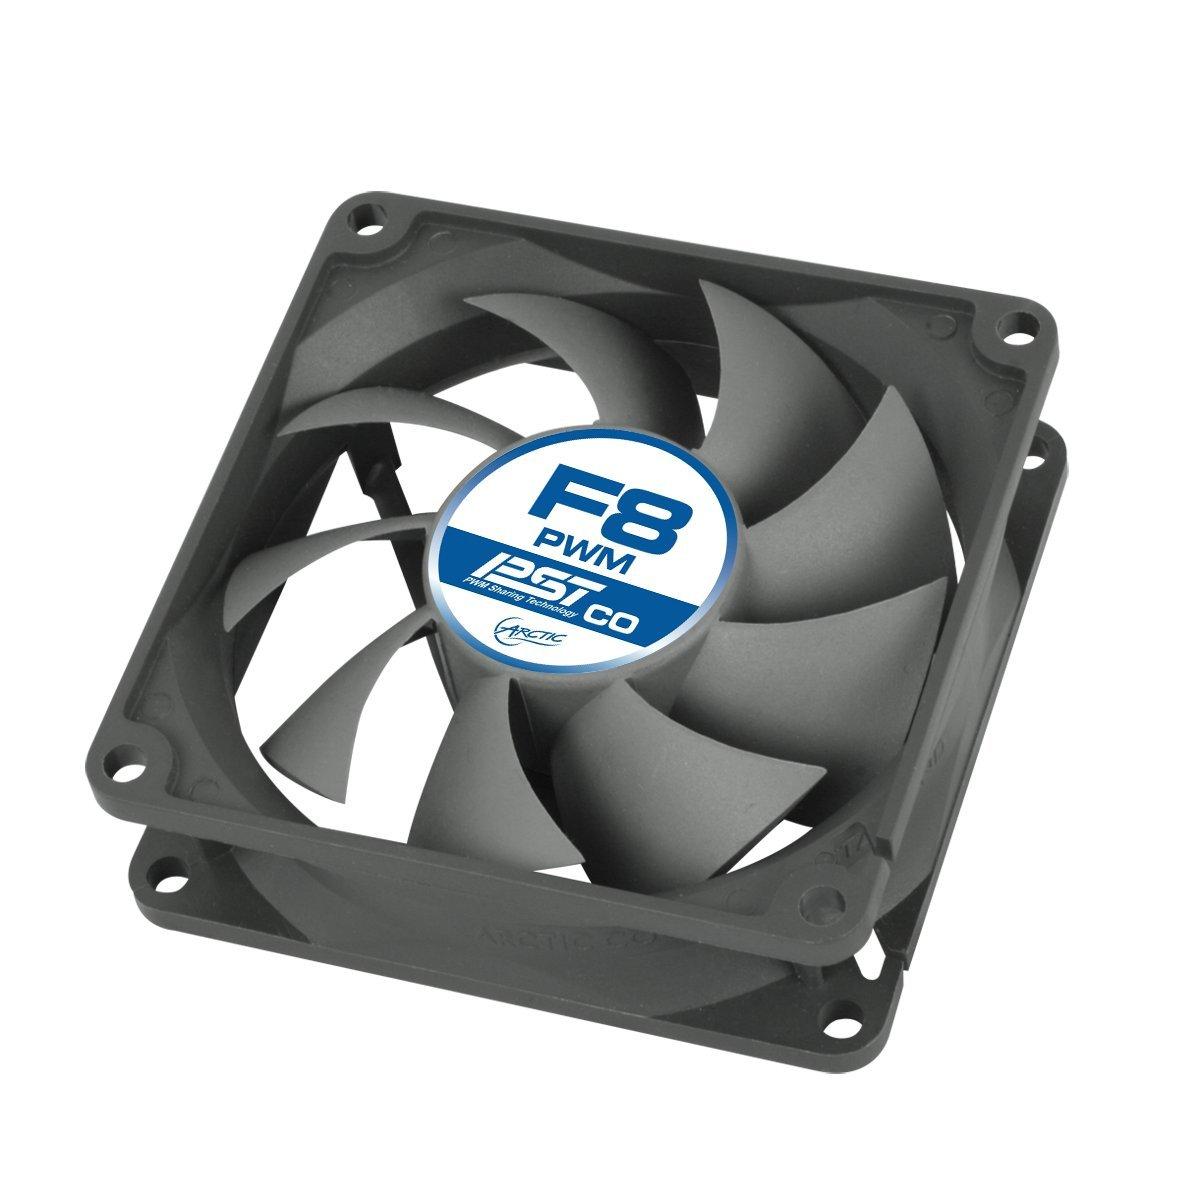 Ac Creative Arctic Cooling F8 Pwm Pst Co 80mm Ventilateur 2000 Rpm afaco 080pc Gba01